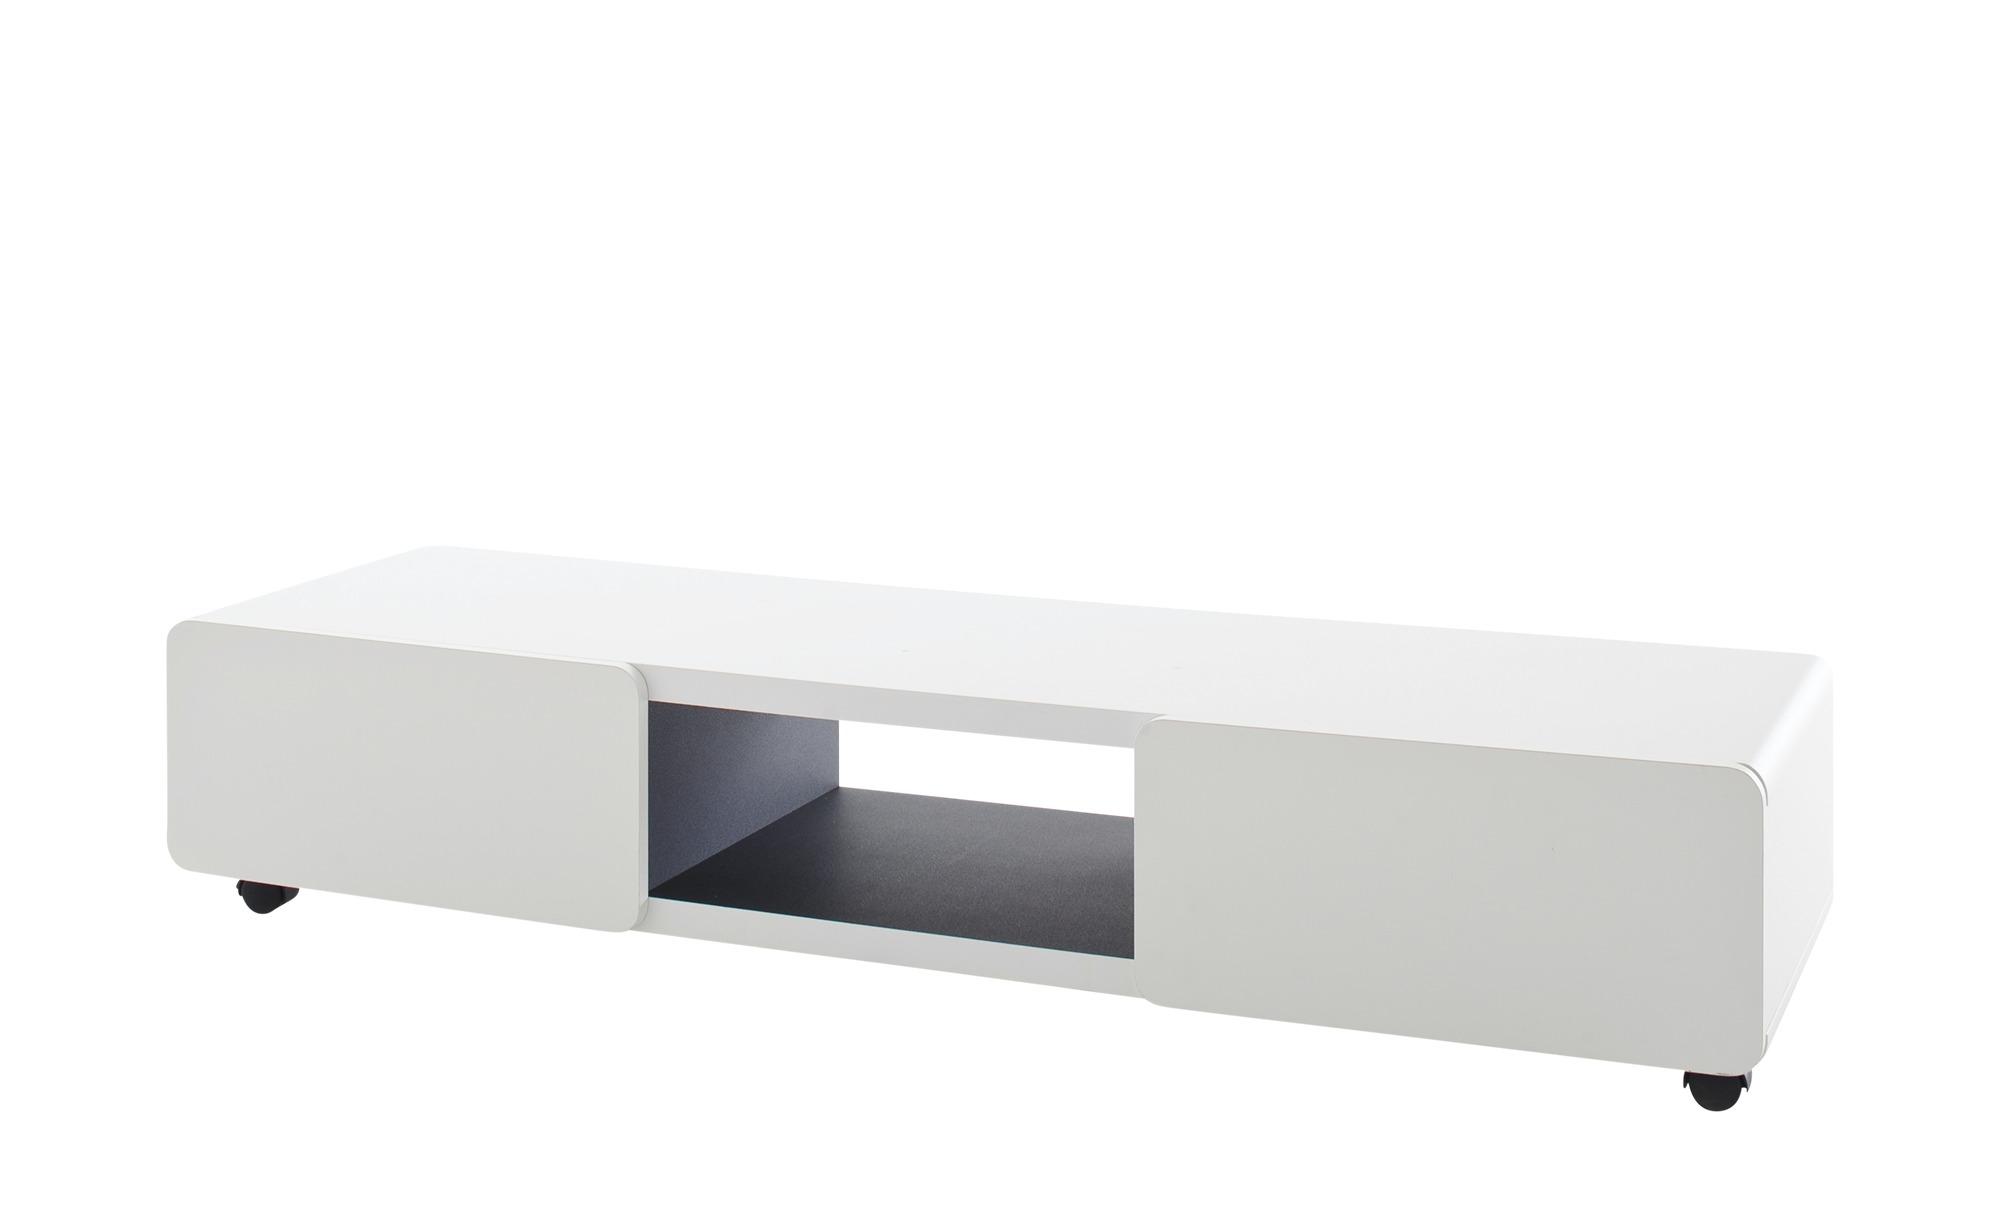 Tv Lowboard Corvara Weiß Maße Cm B 140 H 28 T 41 Tv